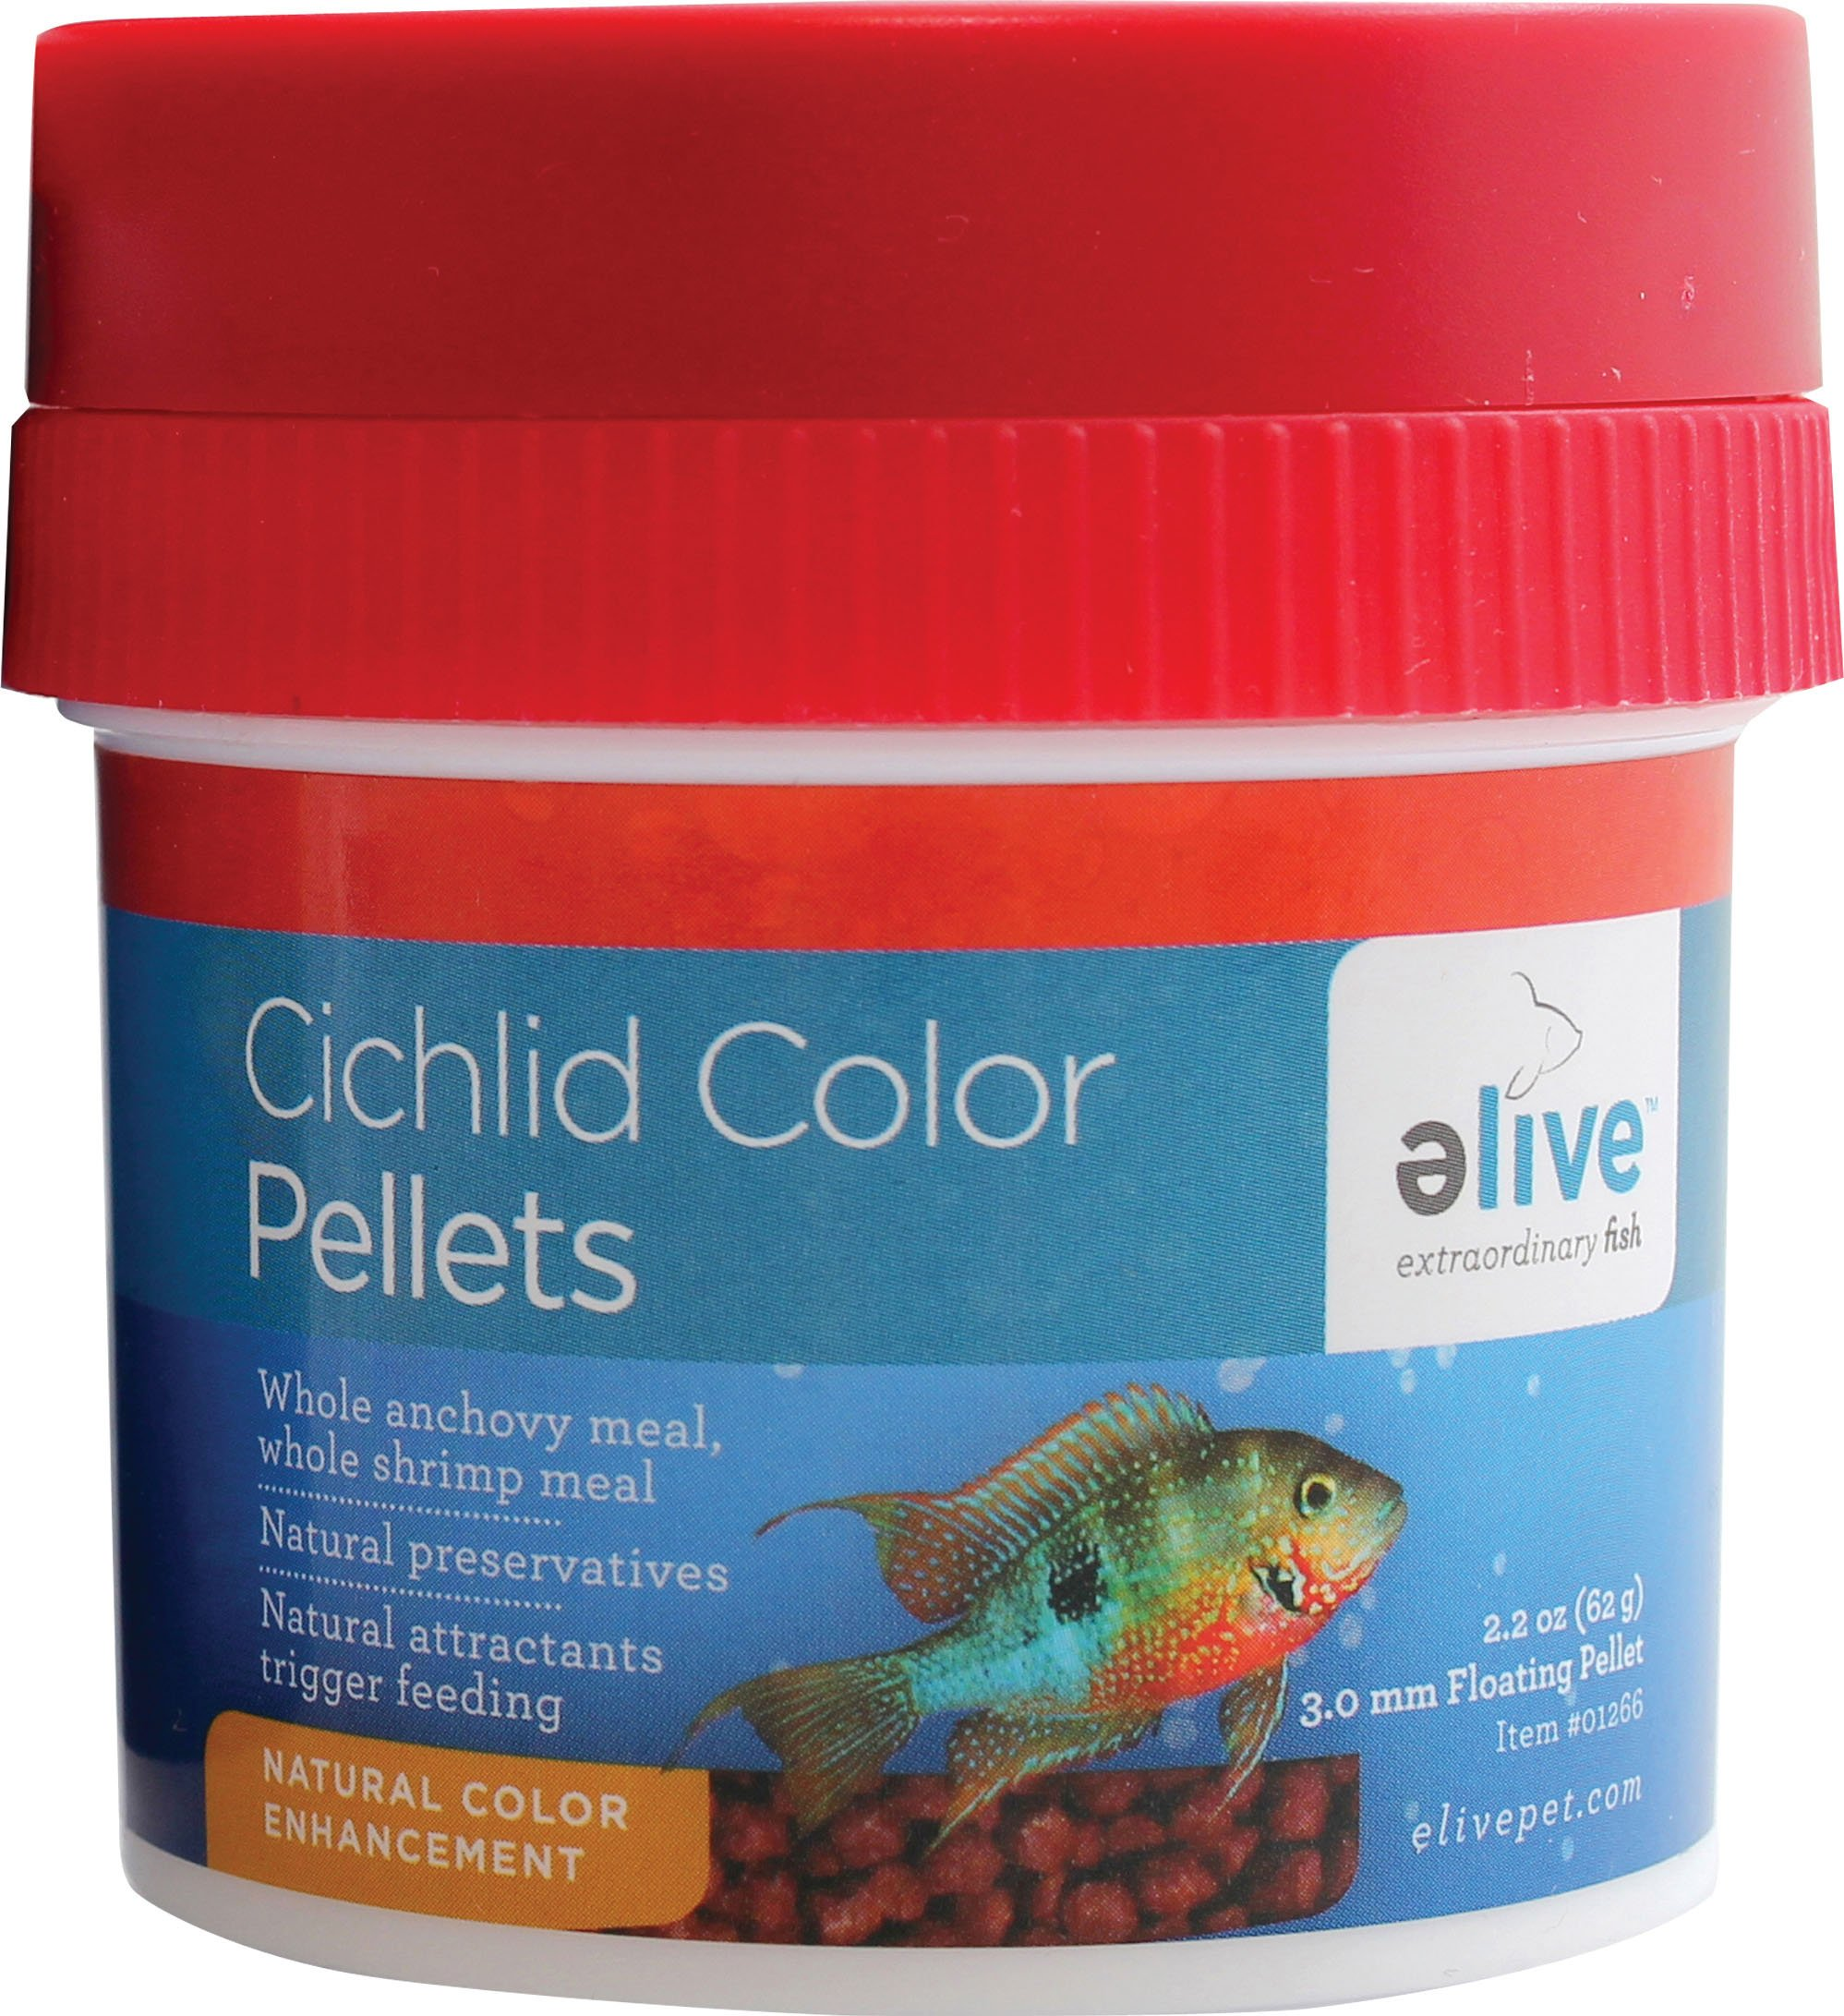 Elive Llc.-Cichlid Color Pellets 2.2 Ounce | Products | Pinterest ...